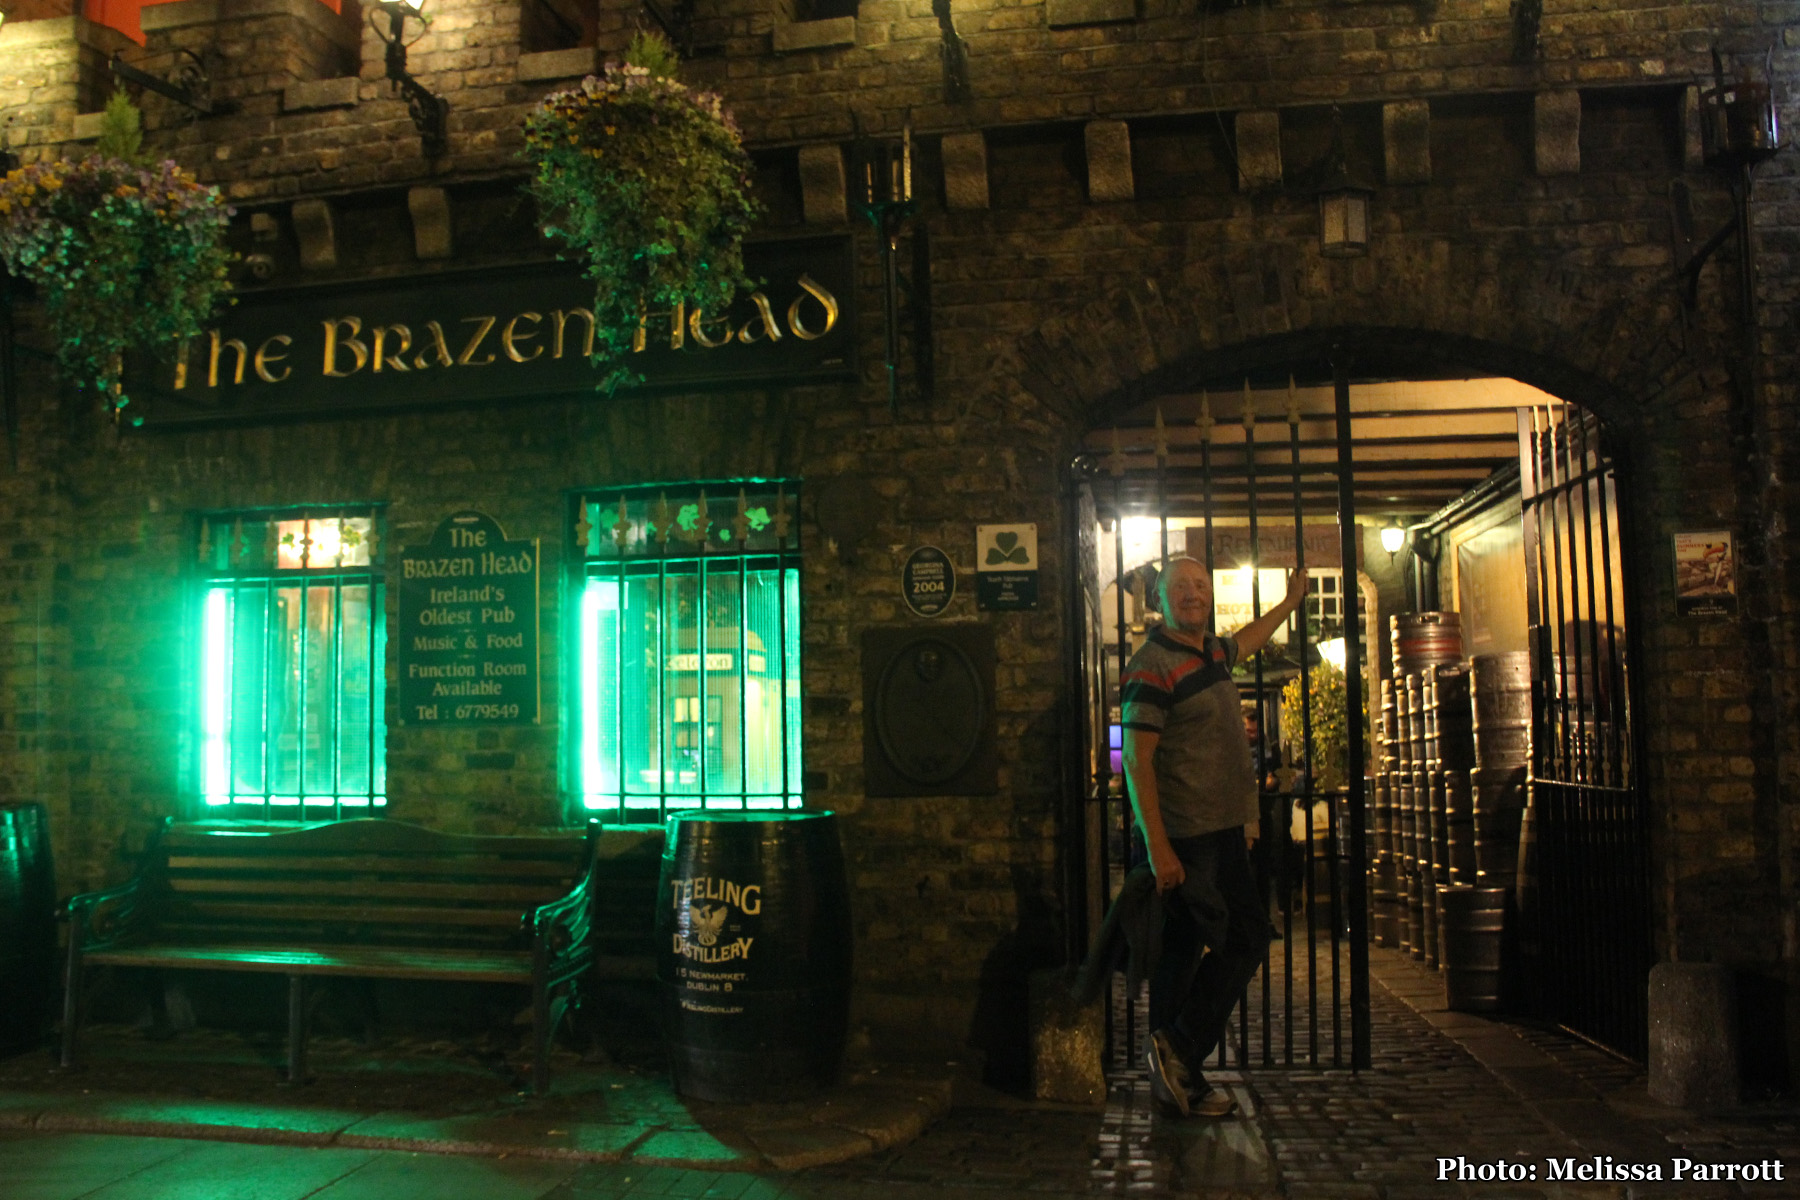 Ireland's Oldest Pub, The Brazenhead